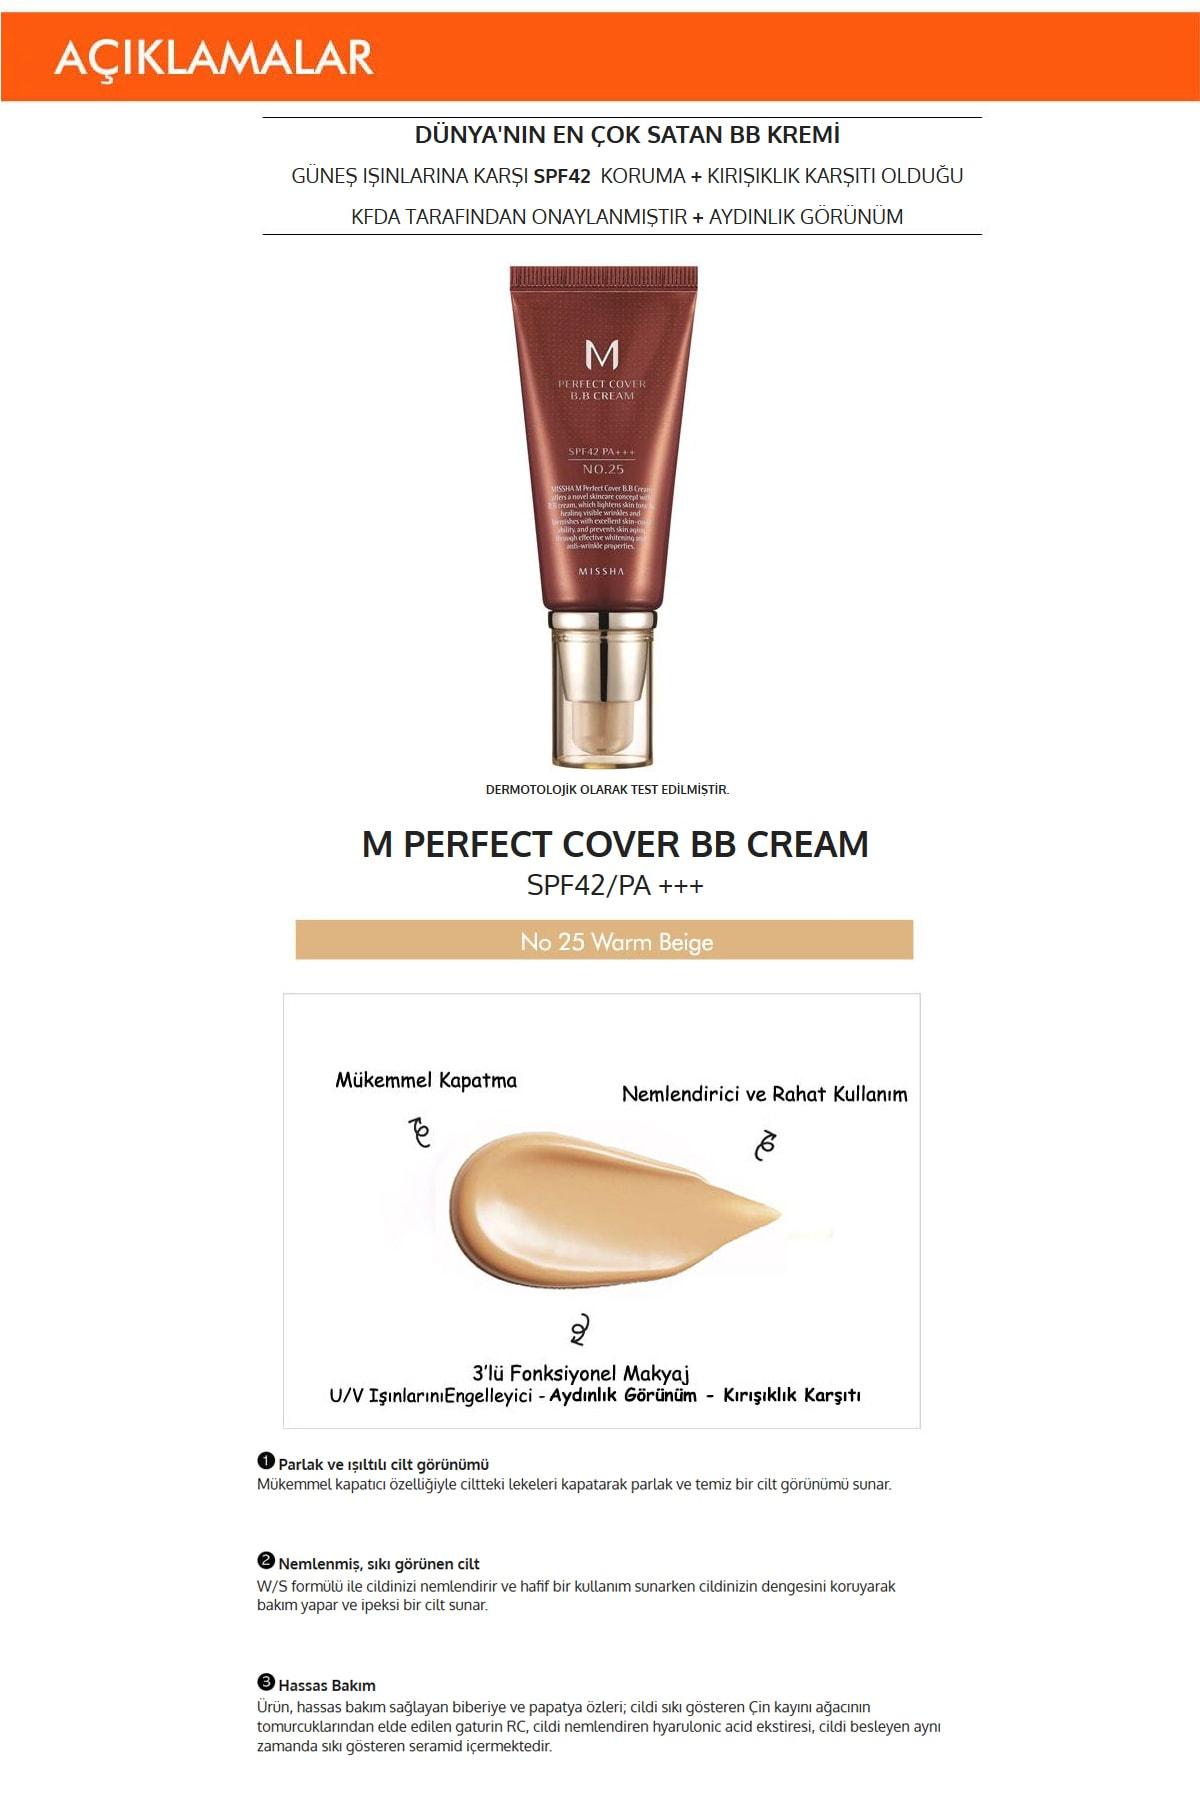 Missha Yoğun Kapatıcılık Sunan Nemlendirici BB Krem 50ml  M Perfect Cover BB Cream SPF42/PA+++ No: 25 1